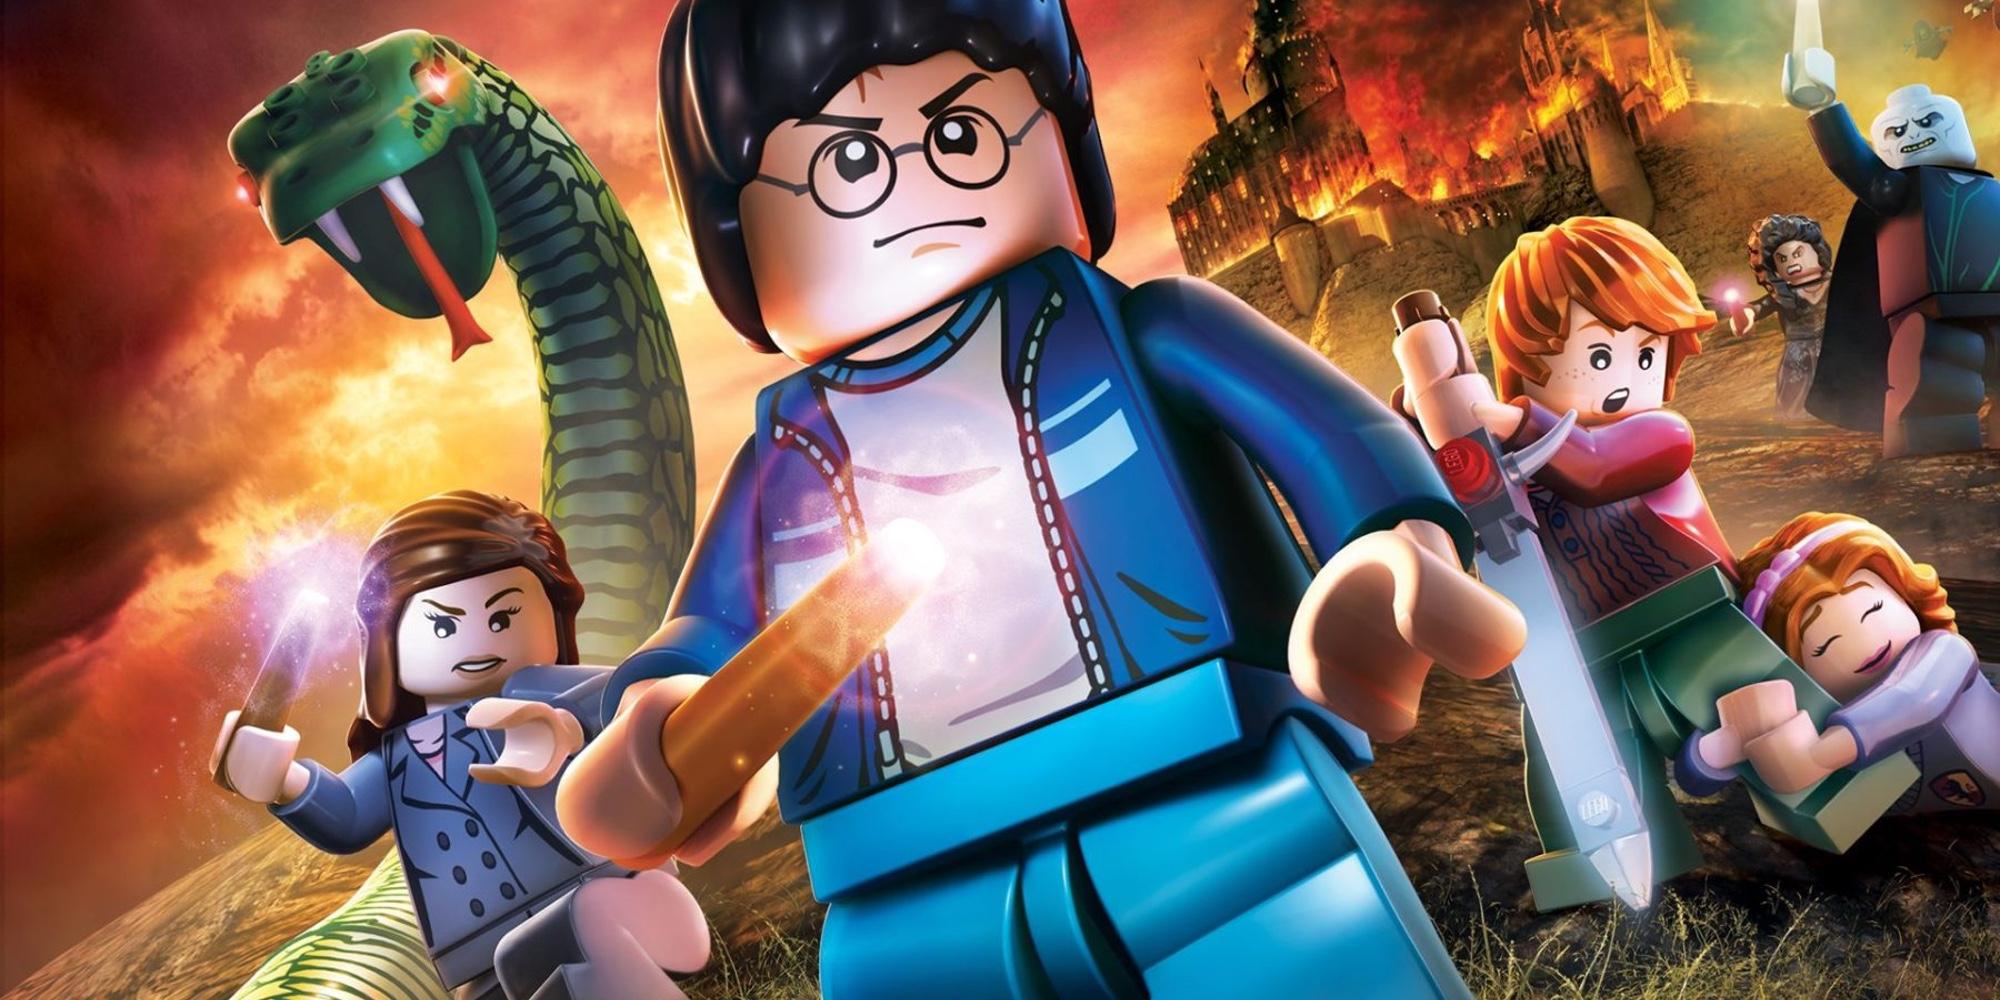 LEGO reveals additional Harry Potter sets for 2018 | Hypable |Harry Potter Impulse Lego Sets